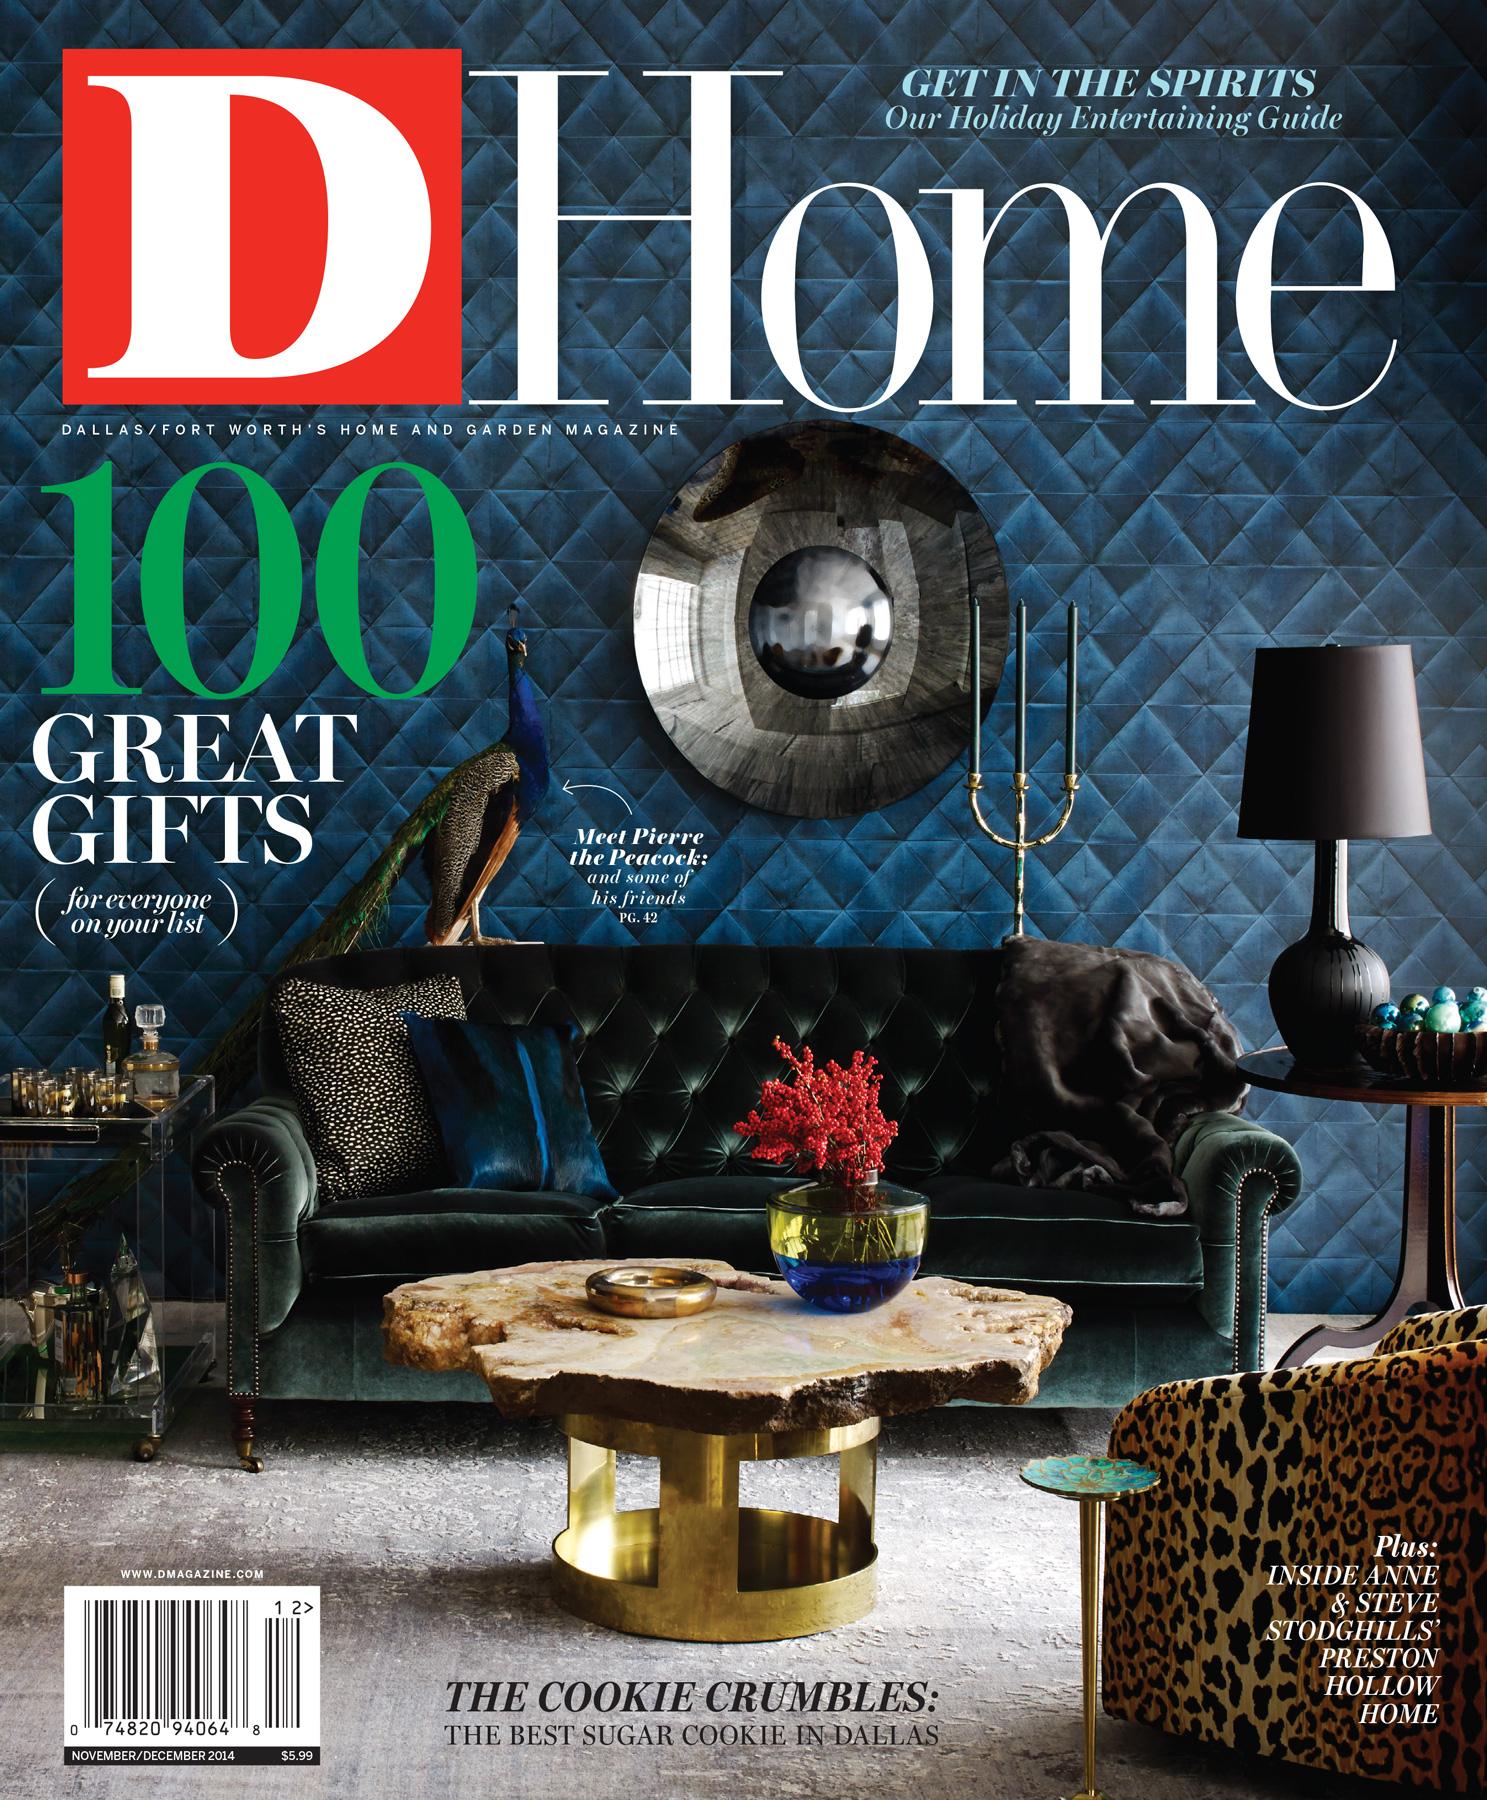 November-December 2014 cover